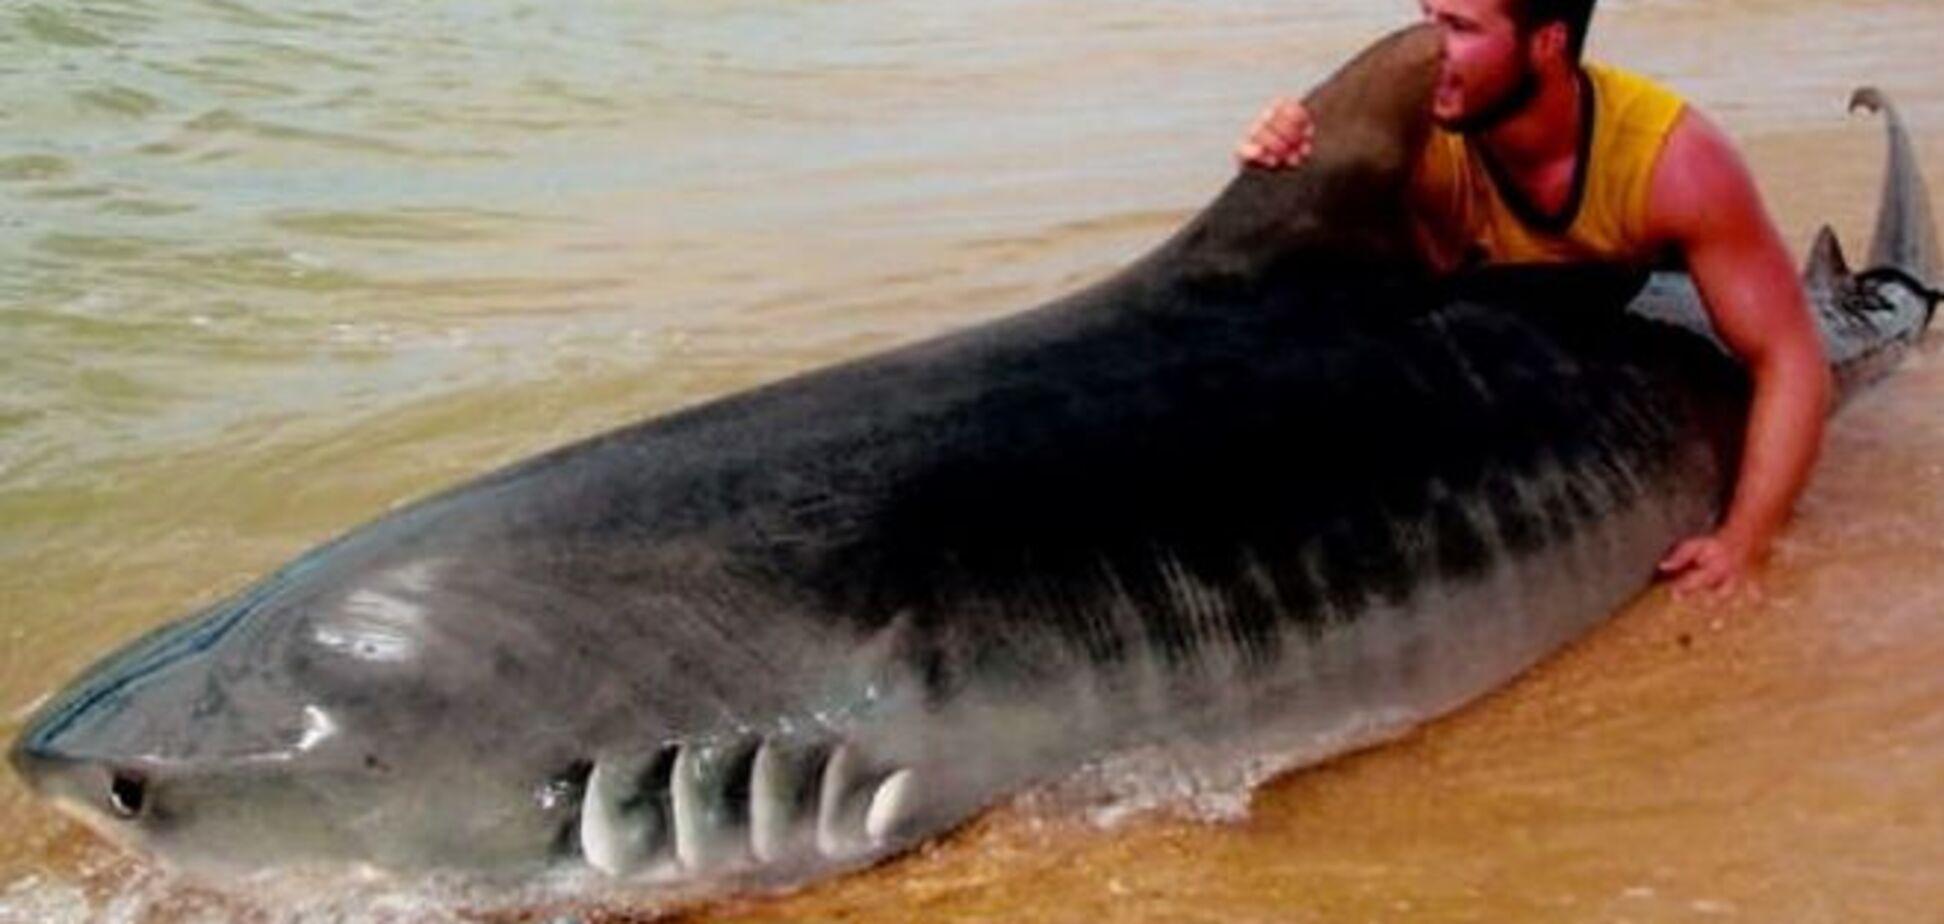 Австралиец поймал тигровую акулу голыми руками: опубликованы фото